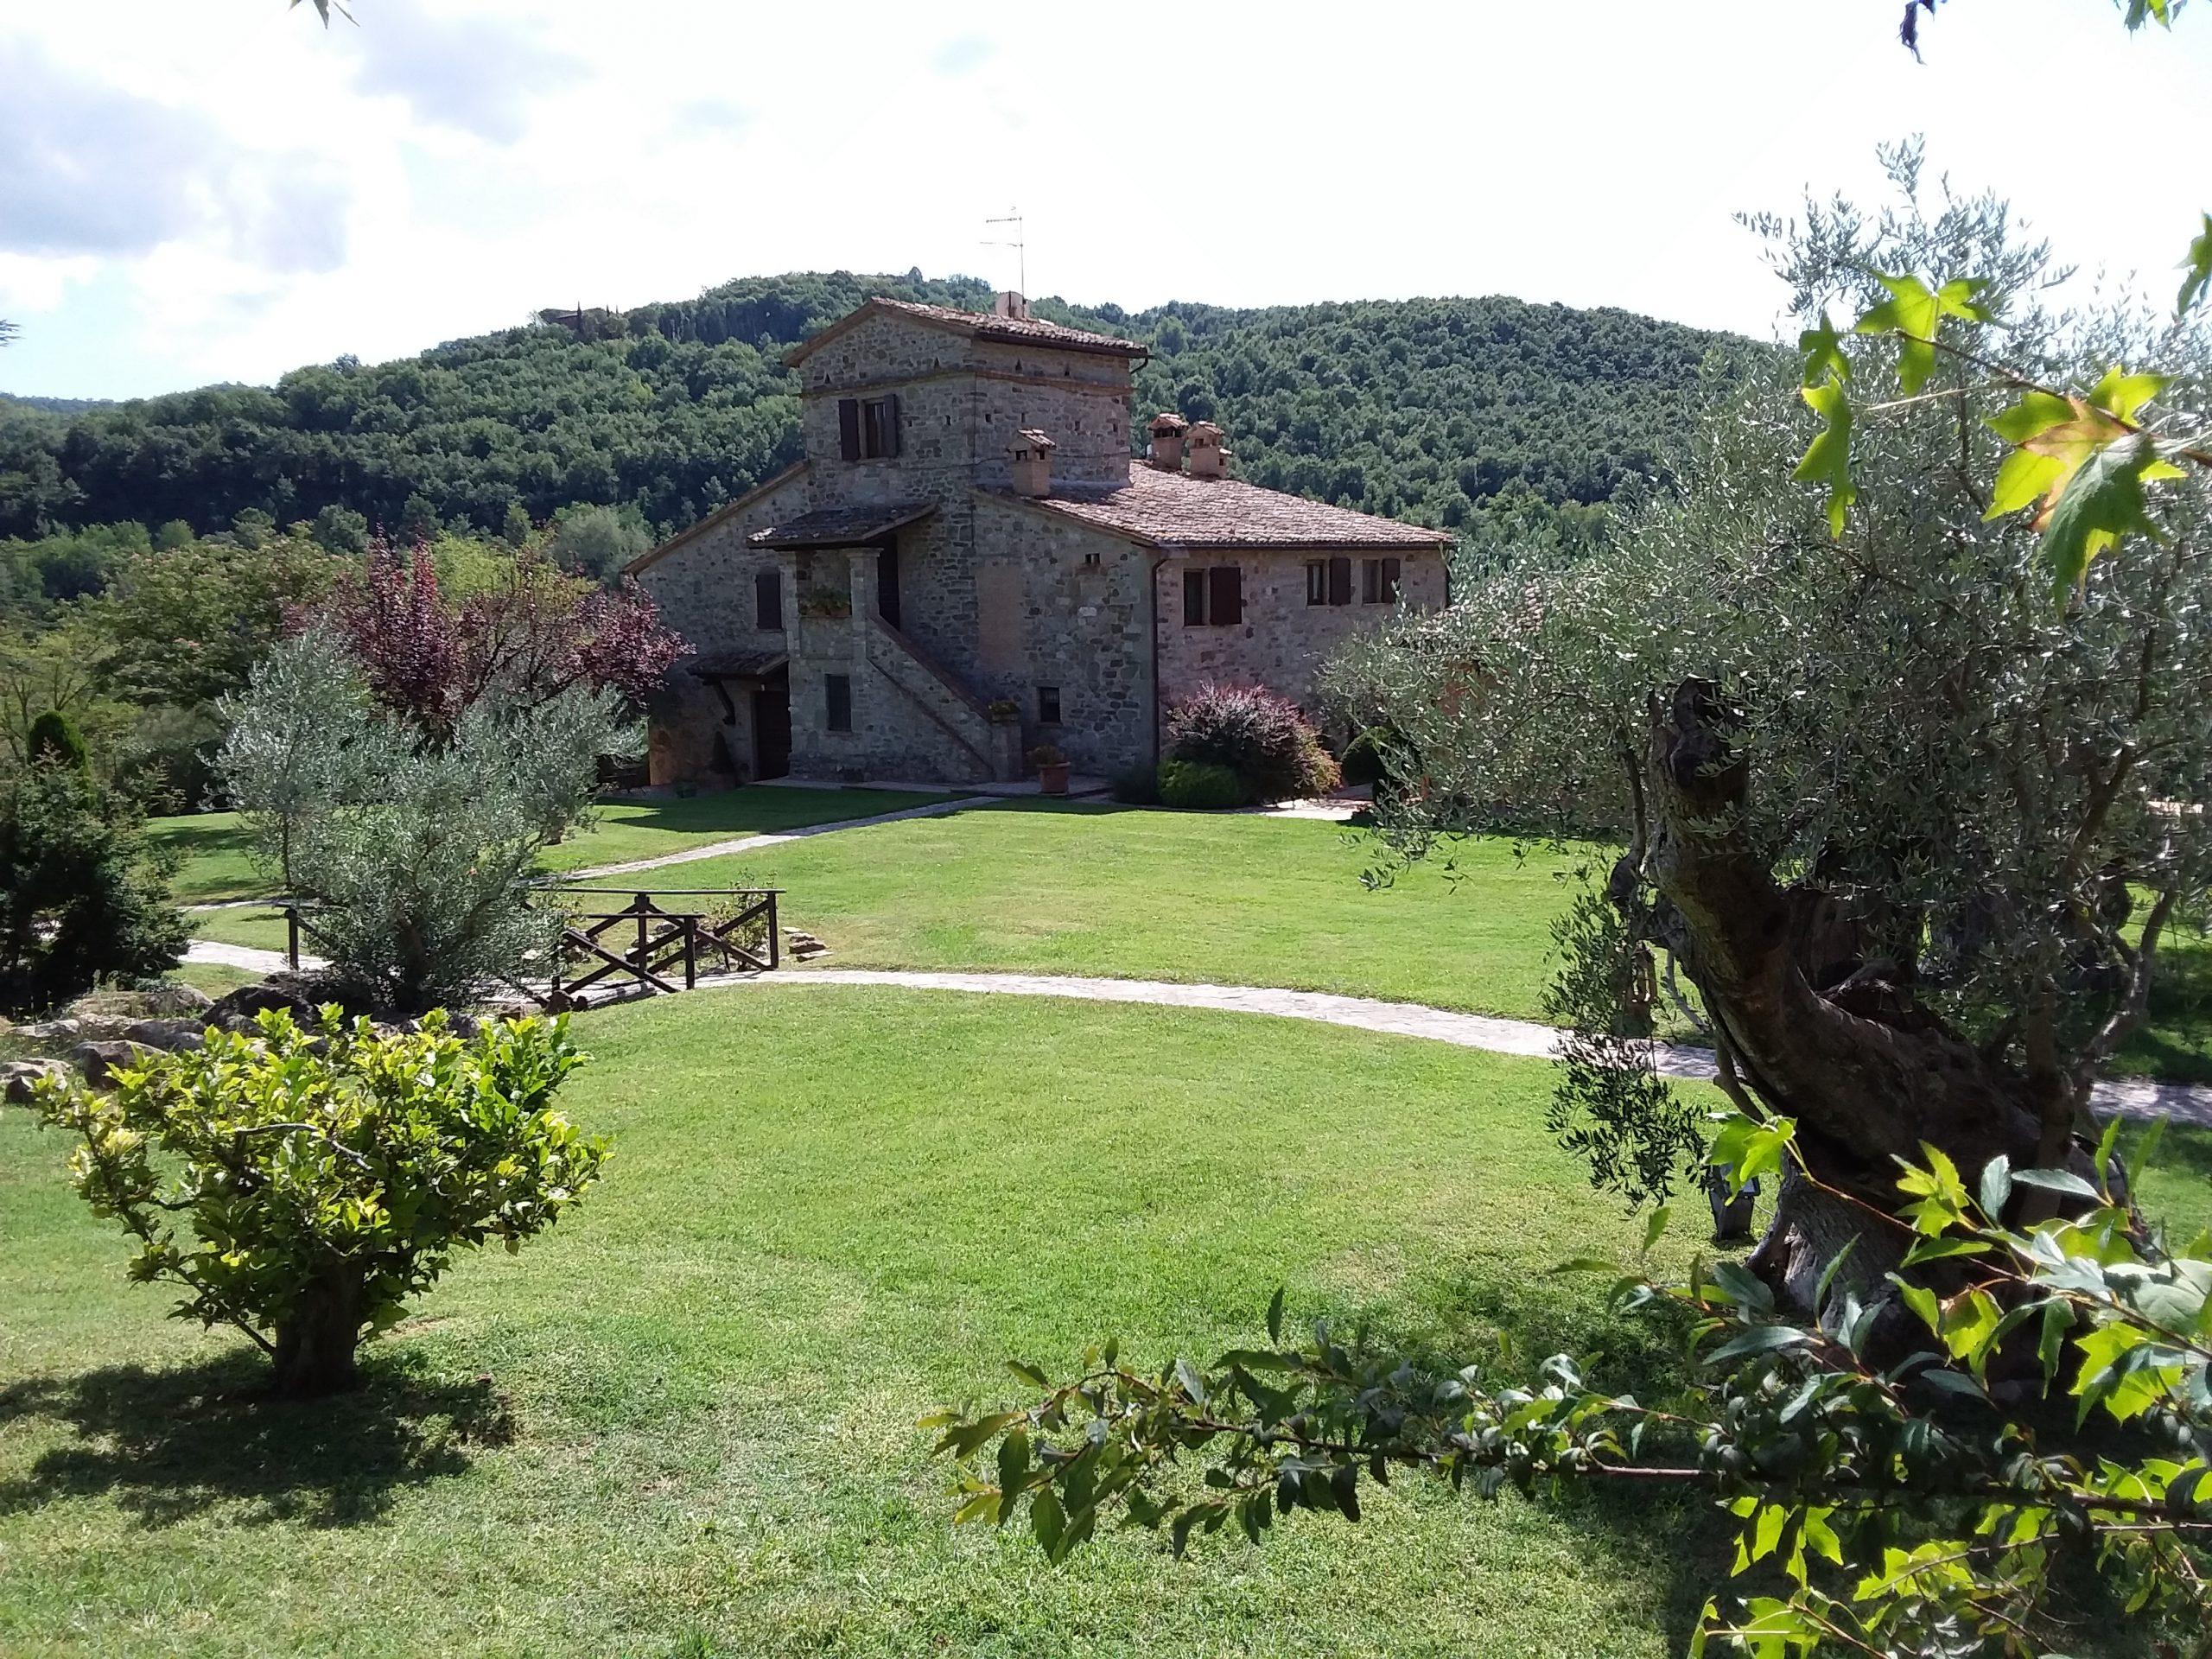 Travelling in Umbria - Il Torrone